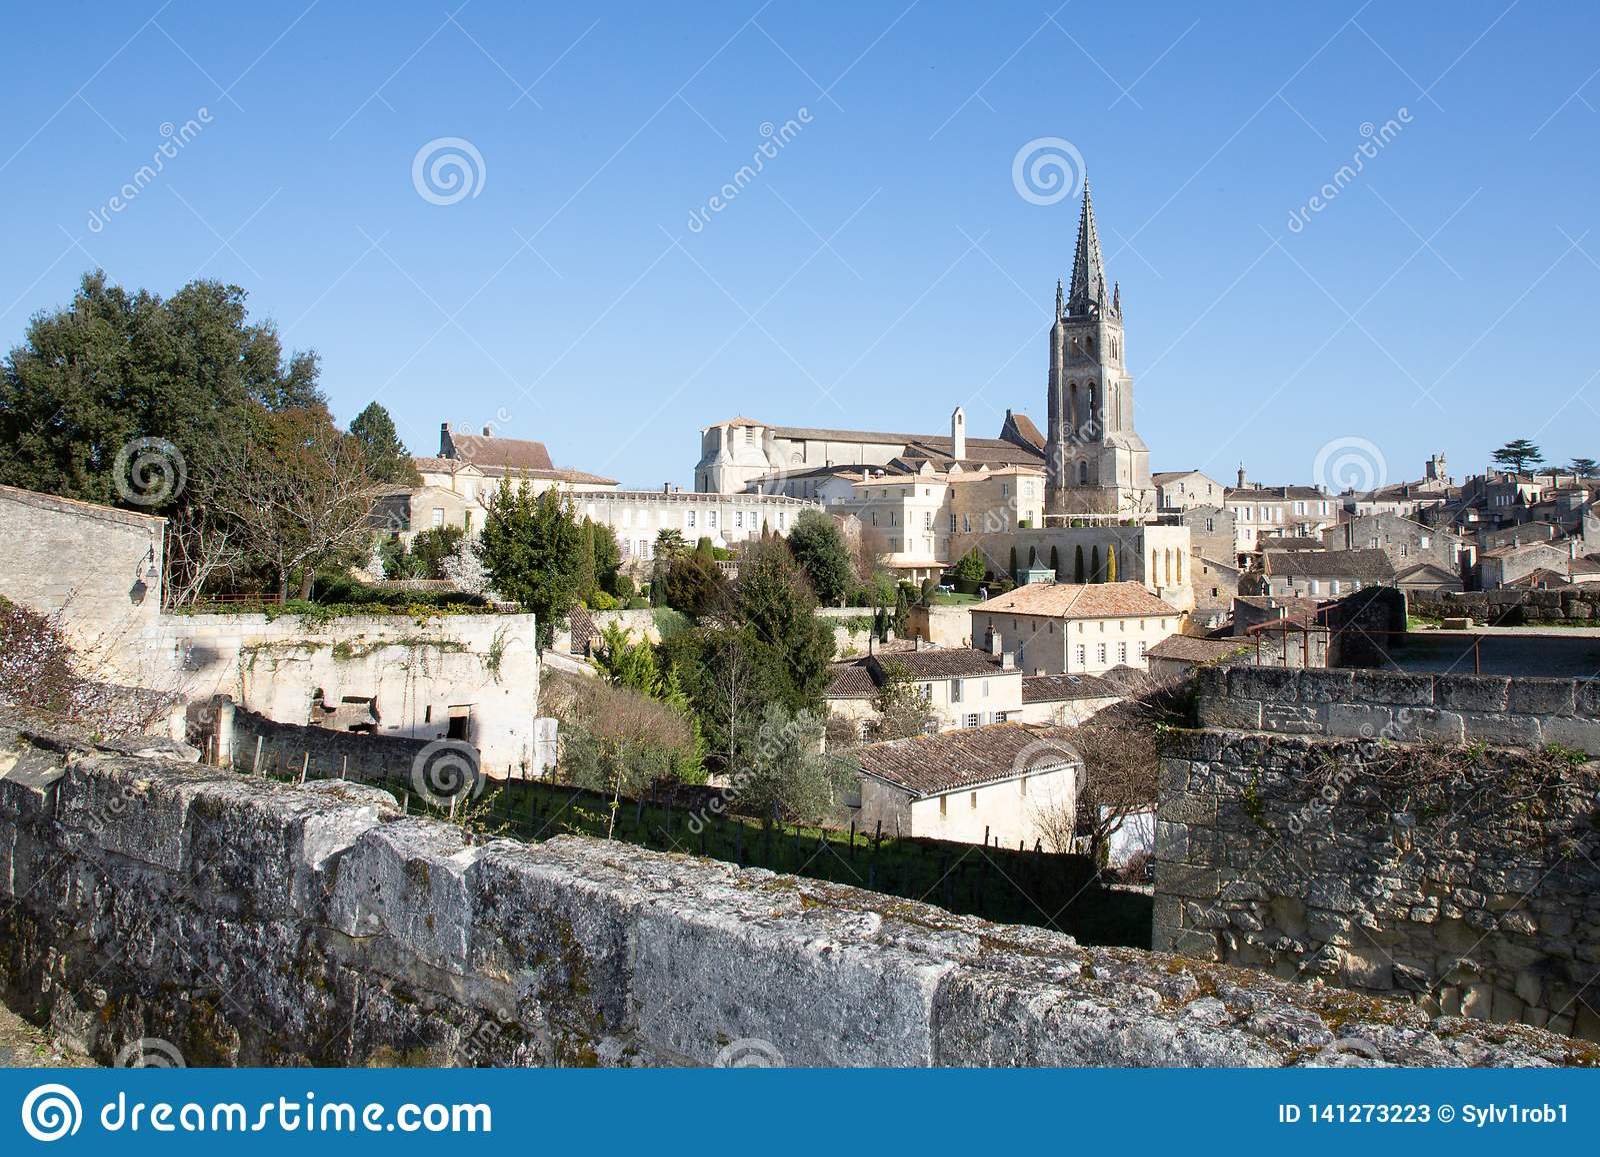 Saint Emilion, Gironde-Aquitaine / France - 03 05 2019 ...